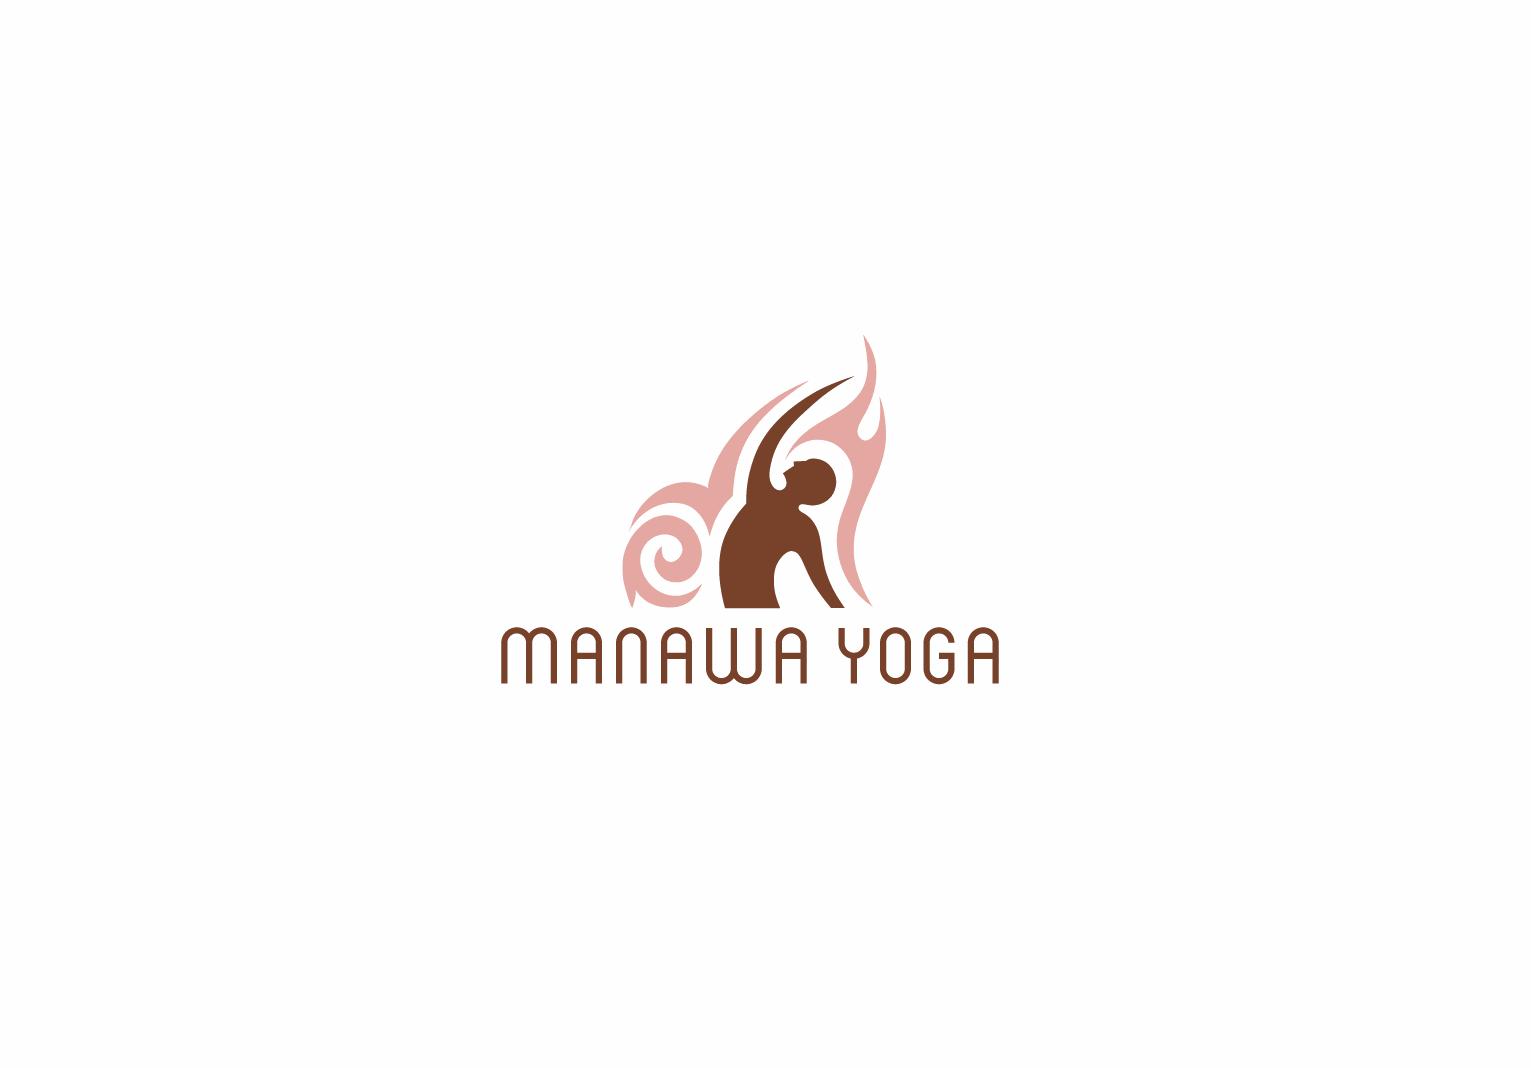 Yoga retreat logo with tribal style